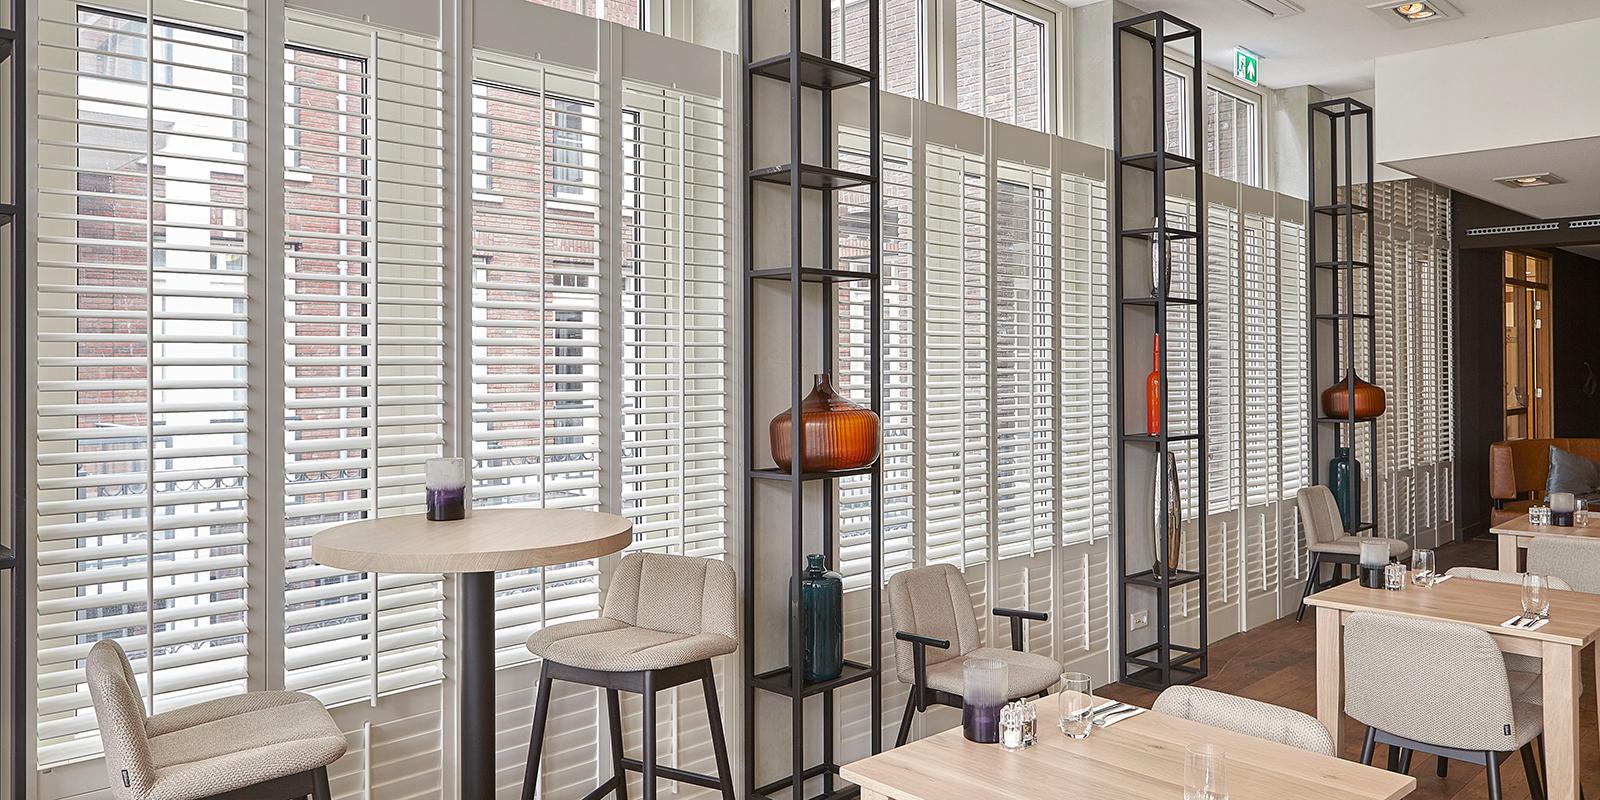 Jasno, Raamdecoratie, Shutters, Ramen, Restaurant Wiesen, Restaurant De Leyhoeve